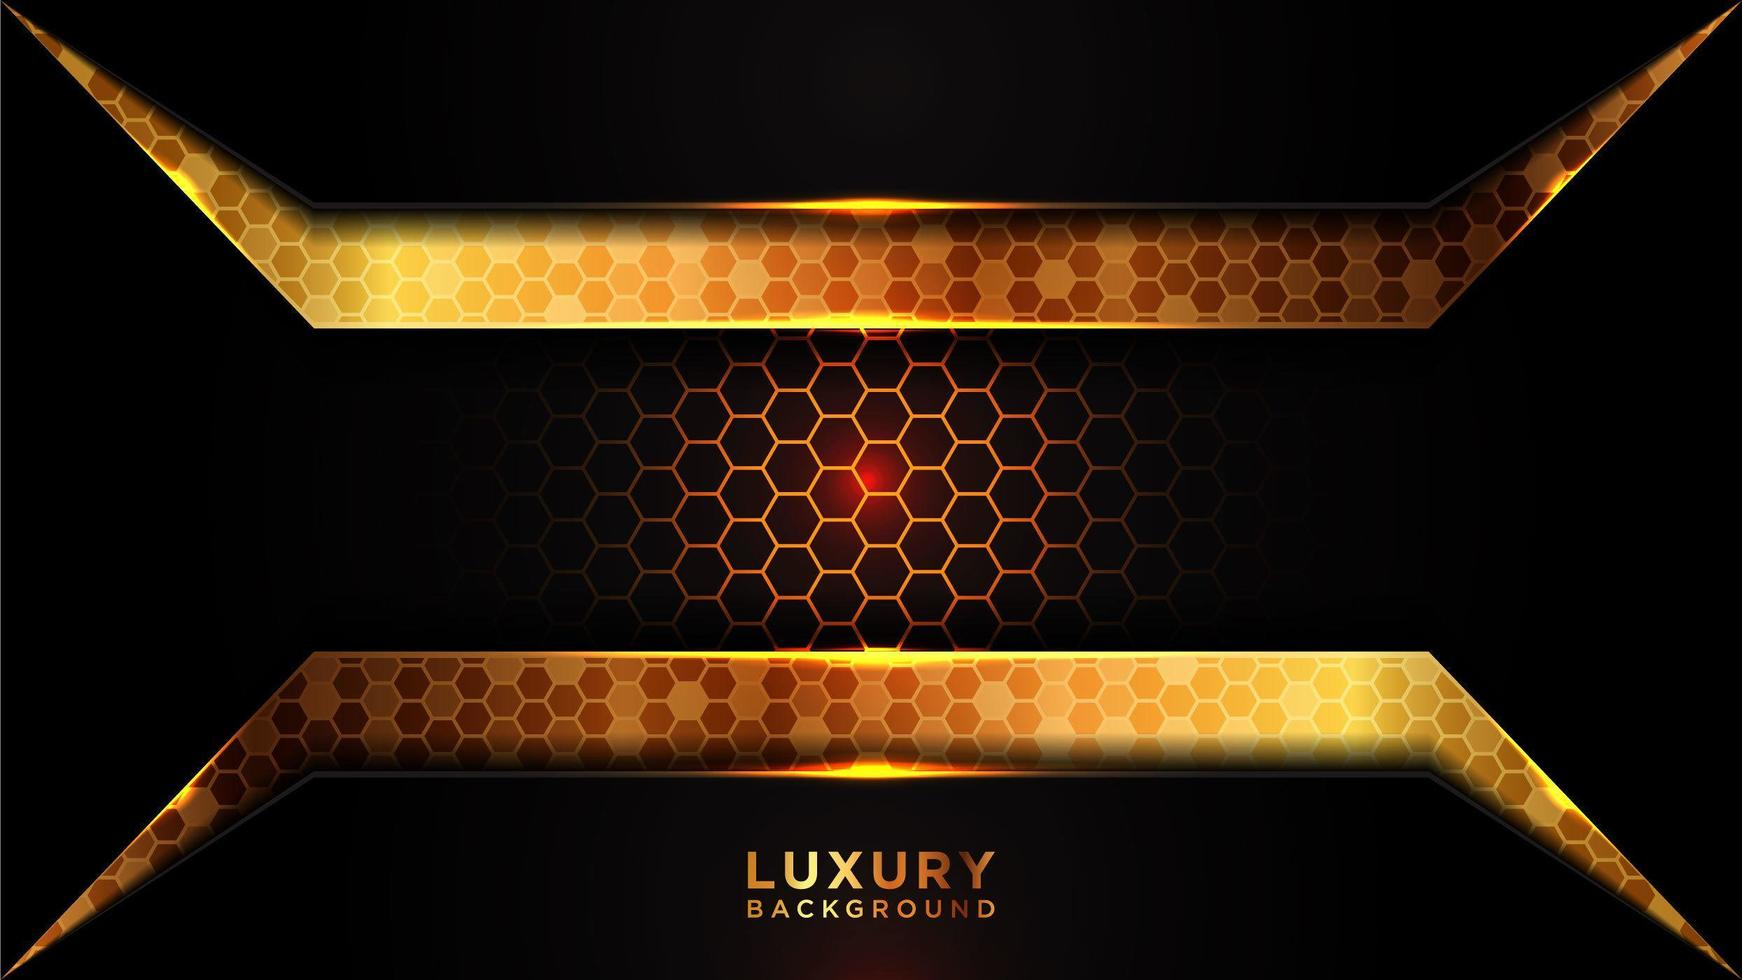 moderne donkere en gouden overlap luxe achtergrond vector